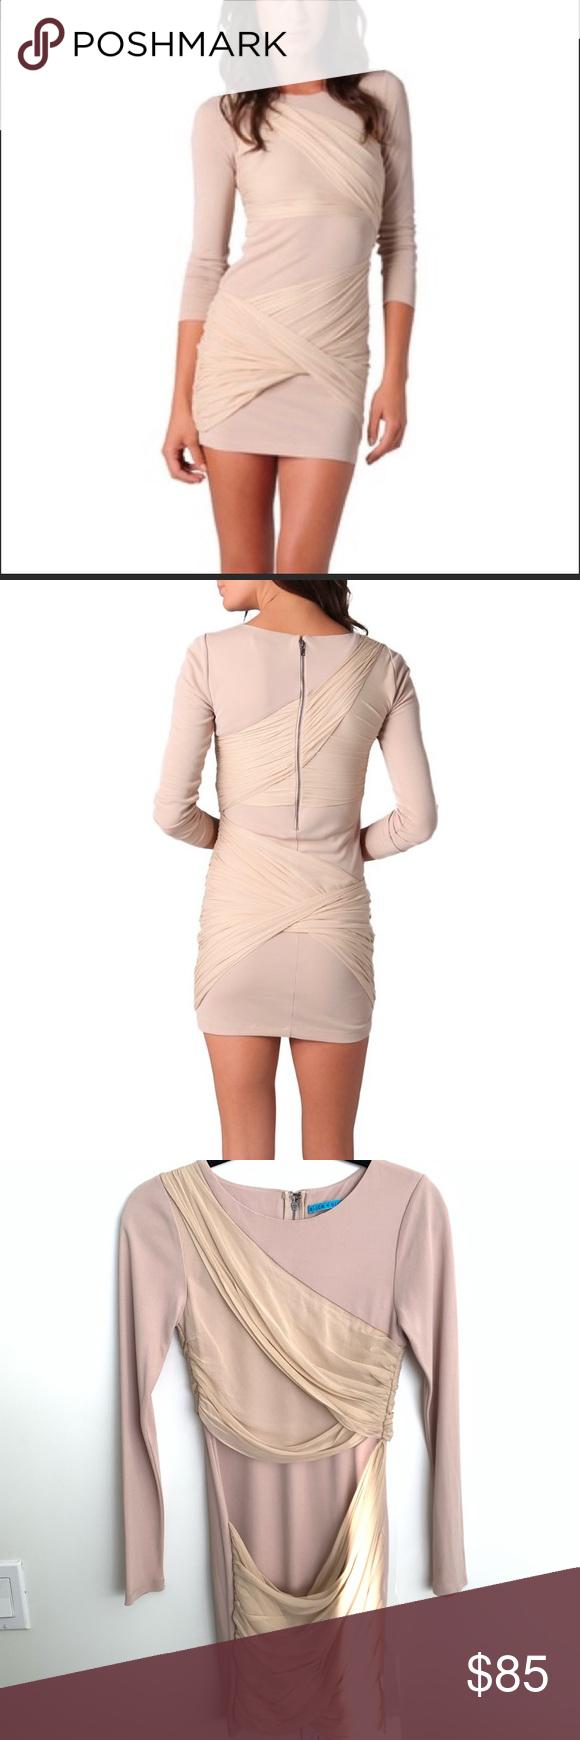 Alicia Olivia Tan Long Sleeve Dress With Drapery Long Sleeve Dress Dresses Clothes Design [ 1740 x 580 Pixel ]